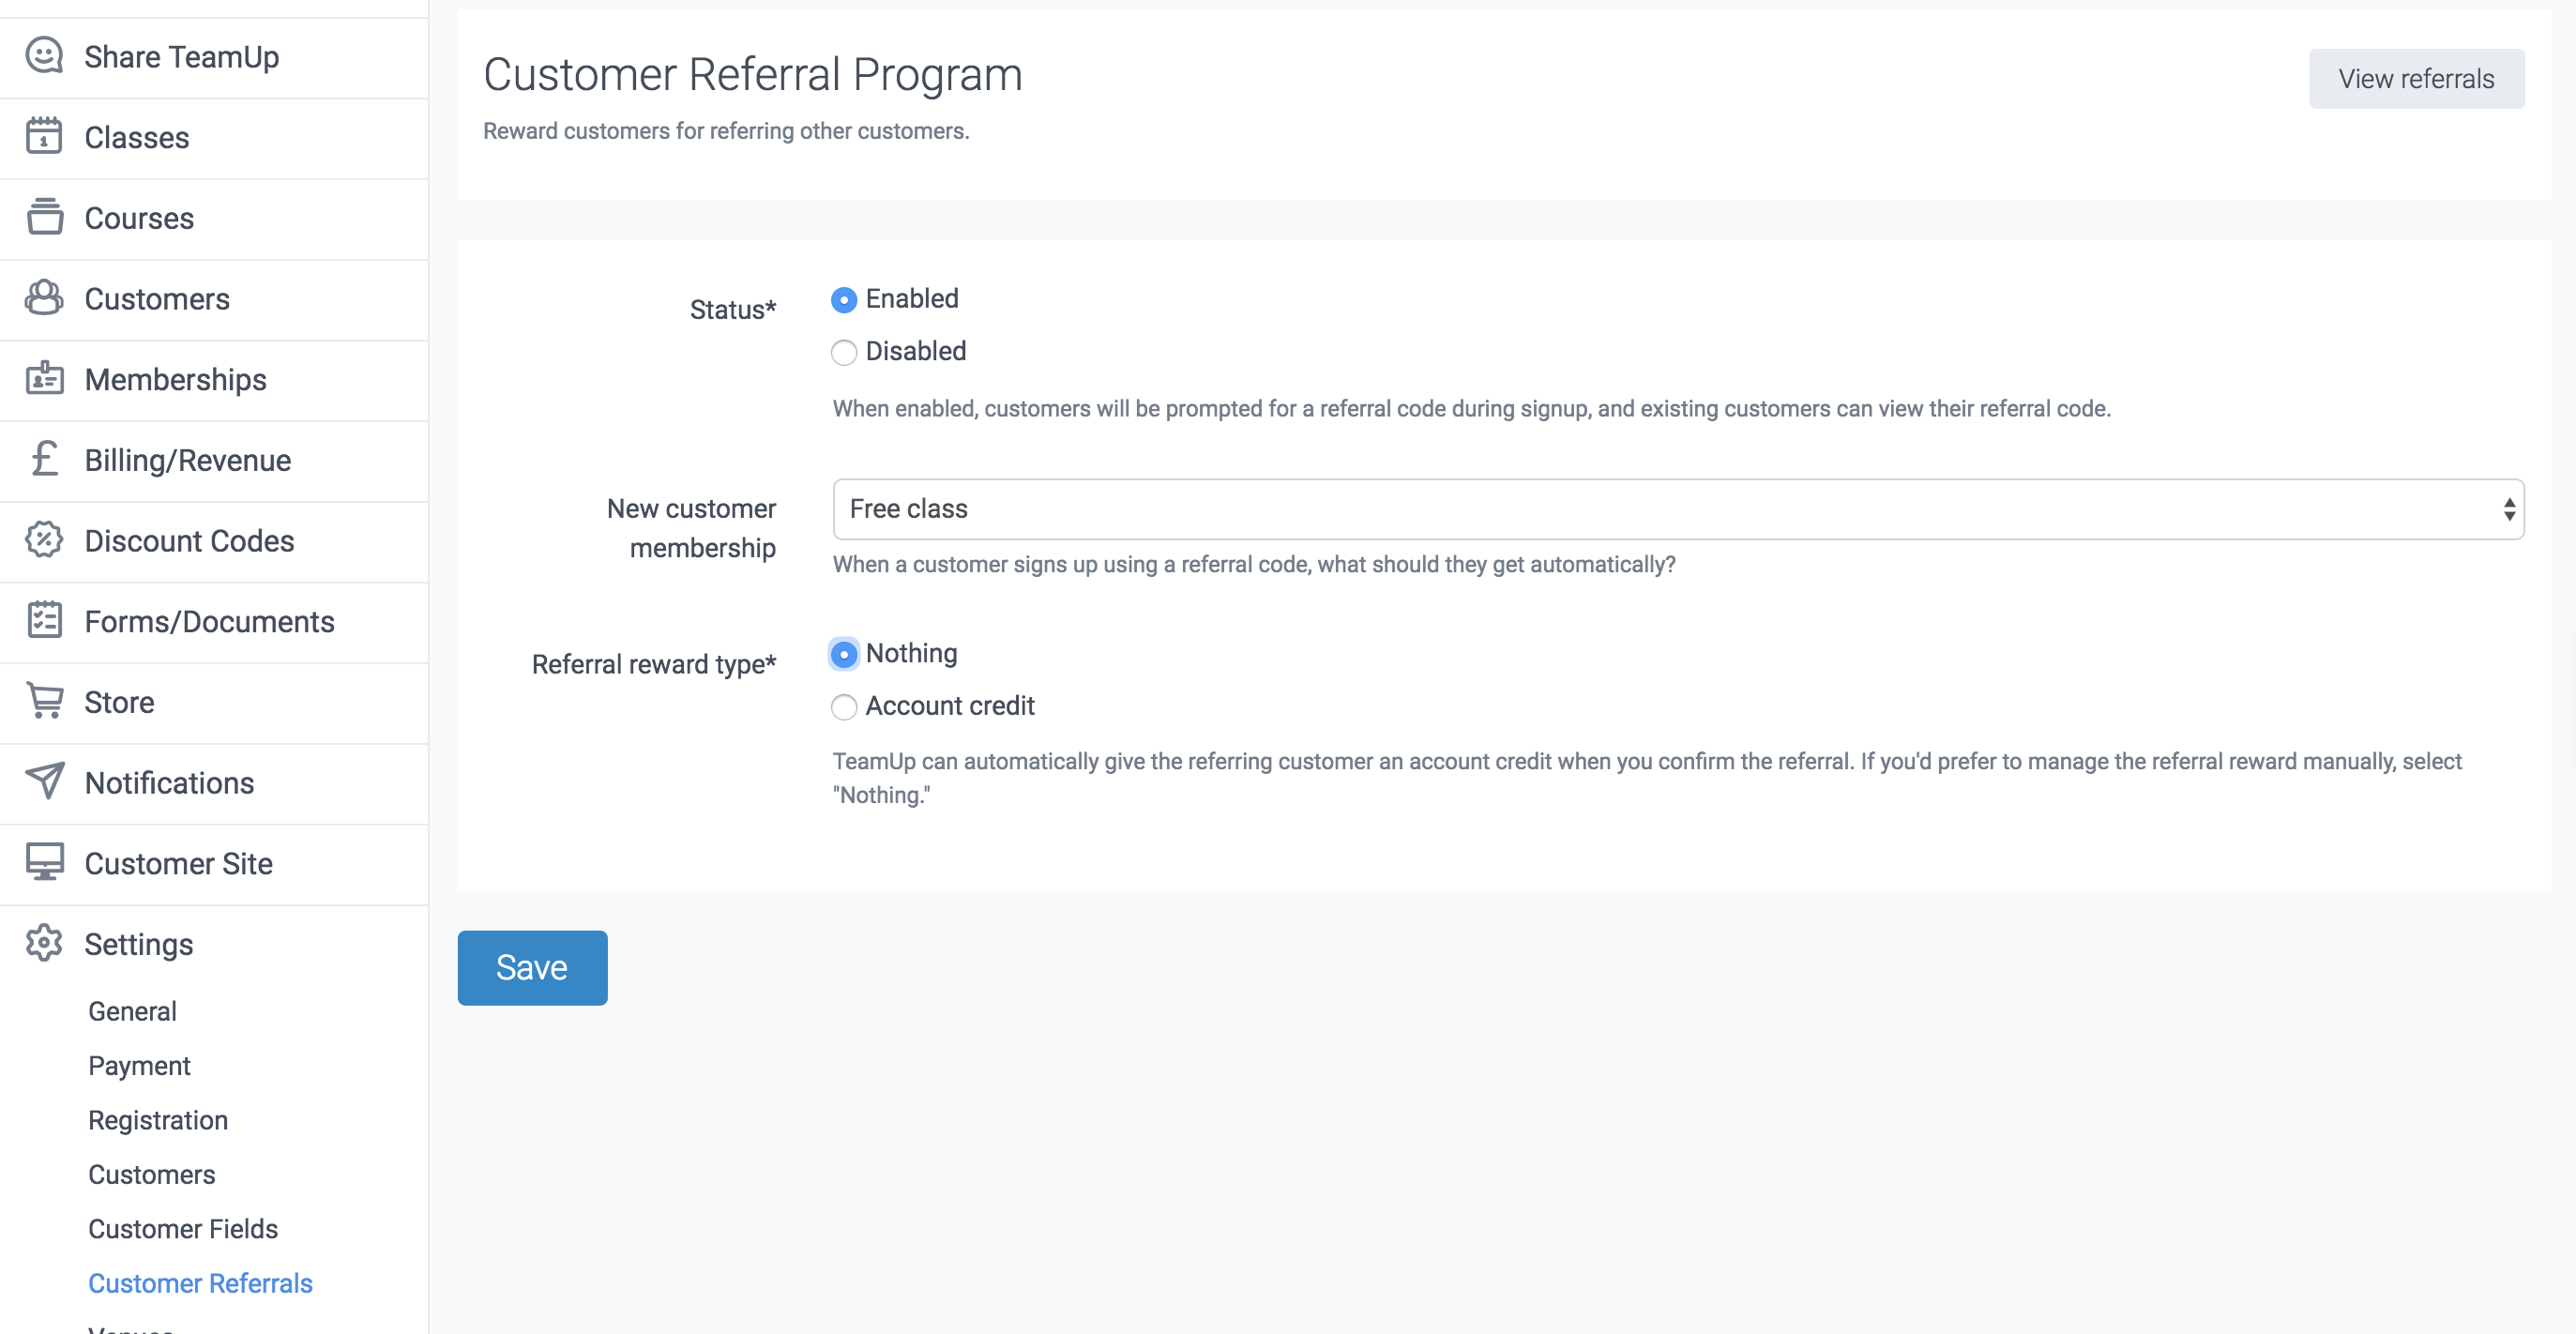 cr-settings_customerreferrals.png